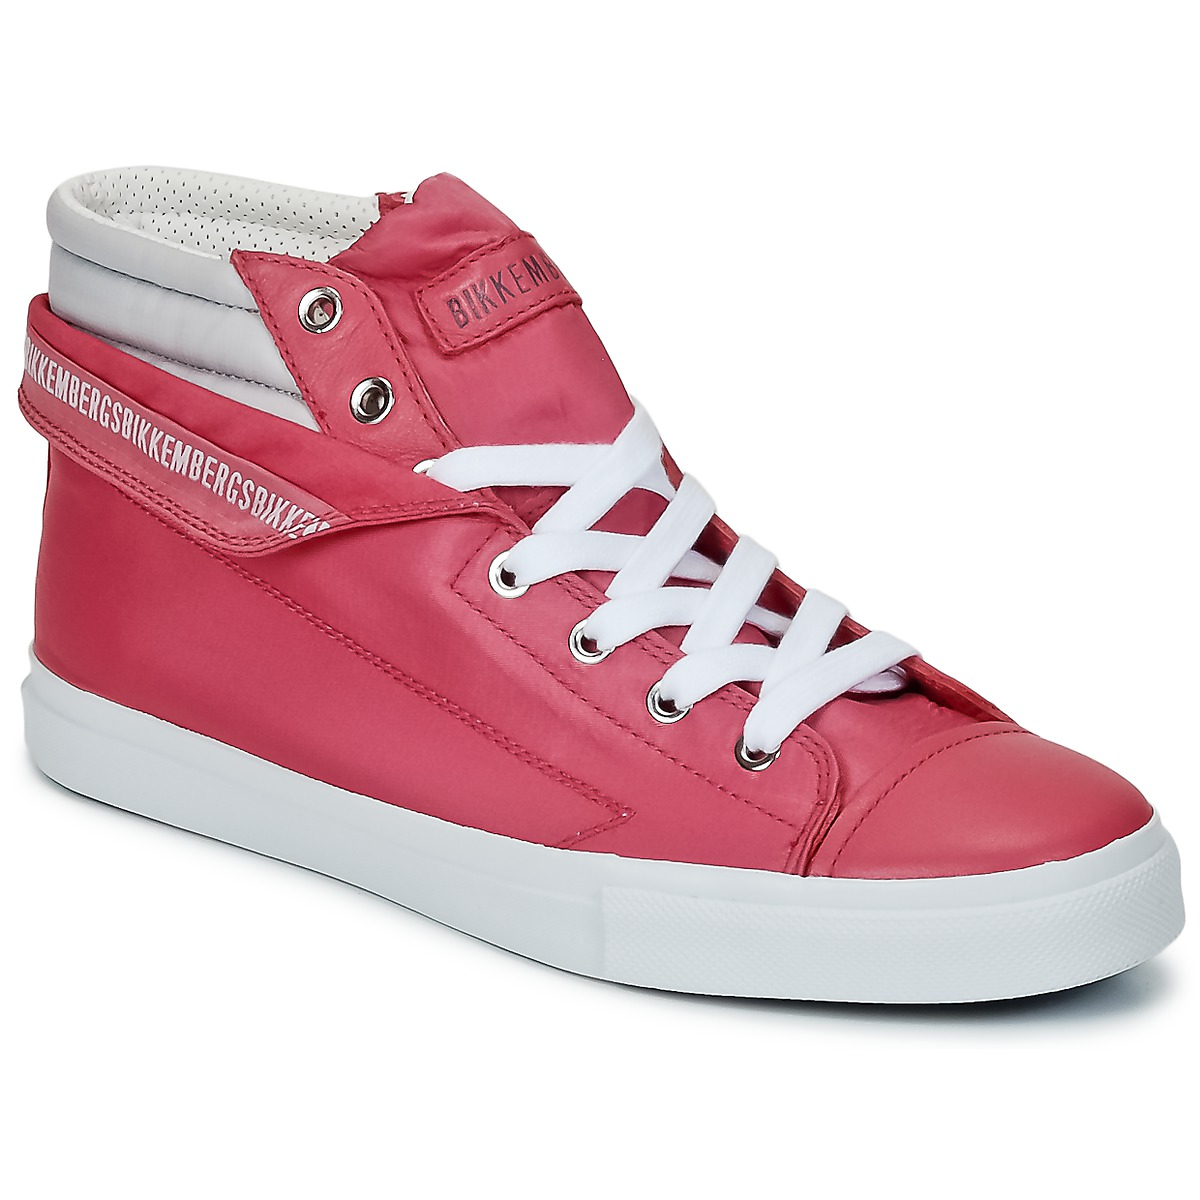 Bikkembergs PLUS 647 Pink / Grau - Kostenloser Versand bei Spartoode ! - Schuhe Sneaker High Damen 81,50 €